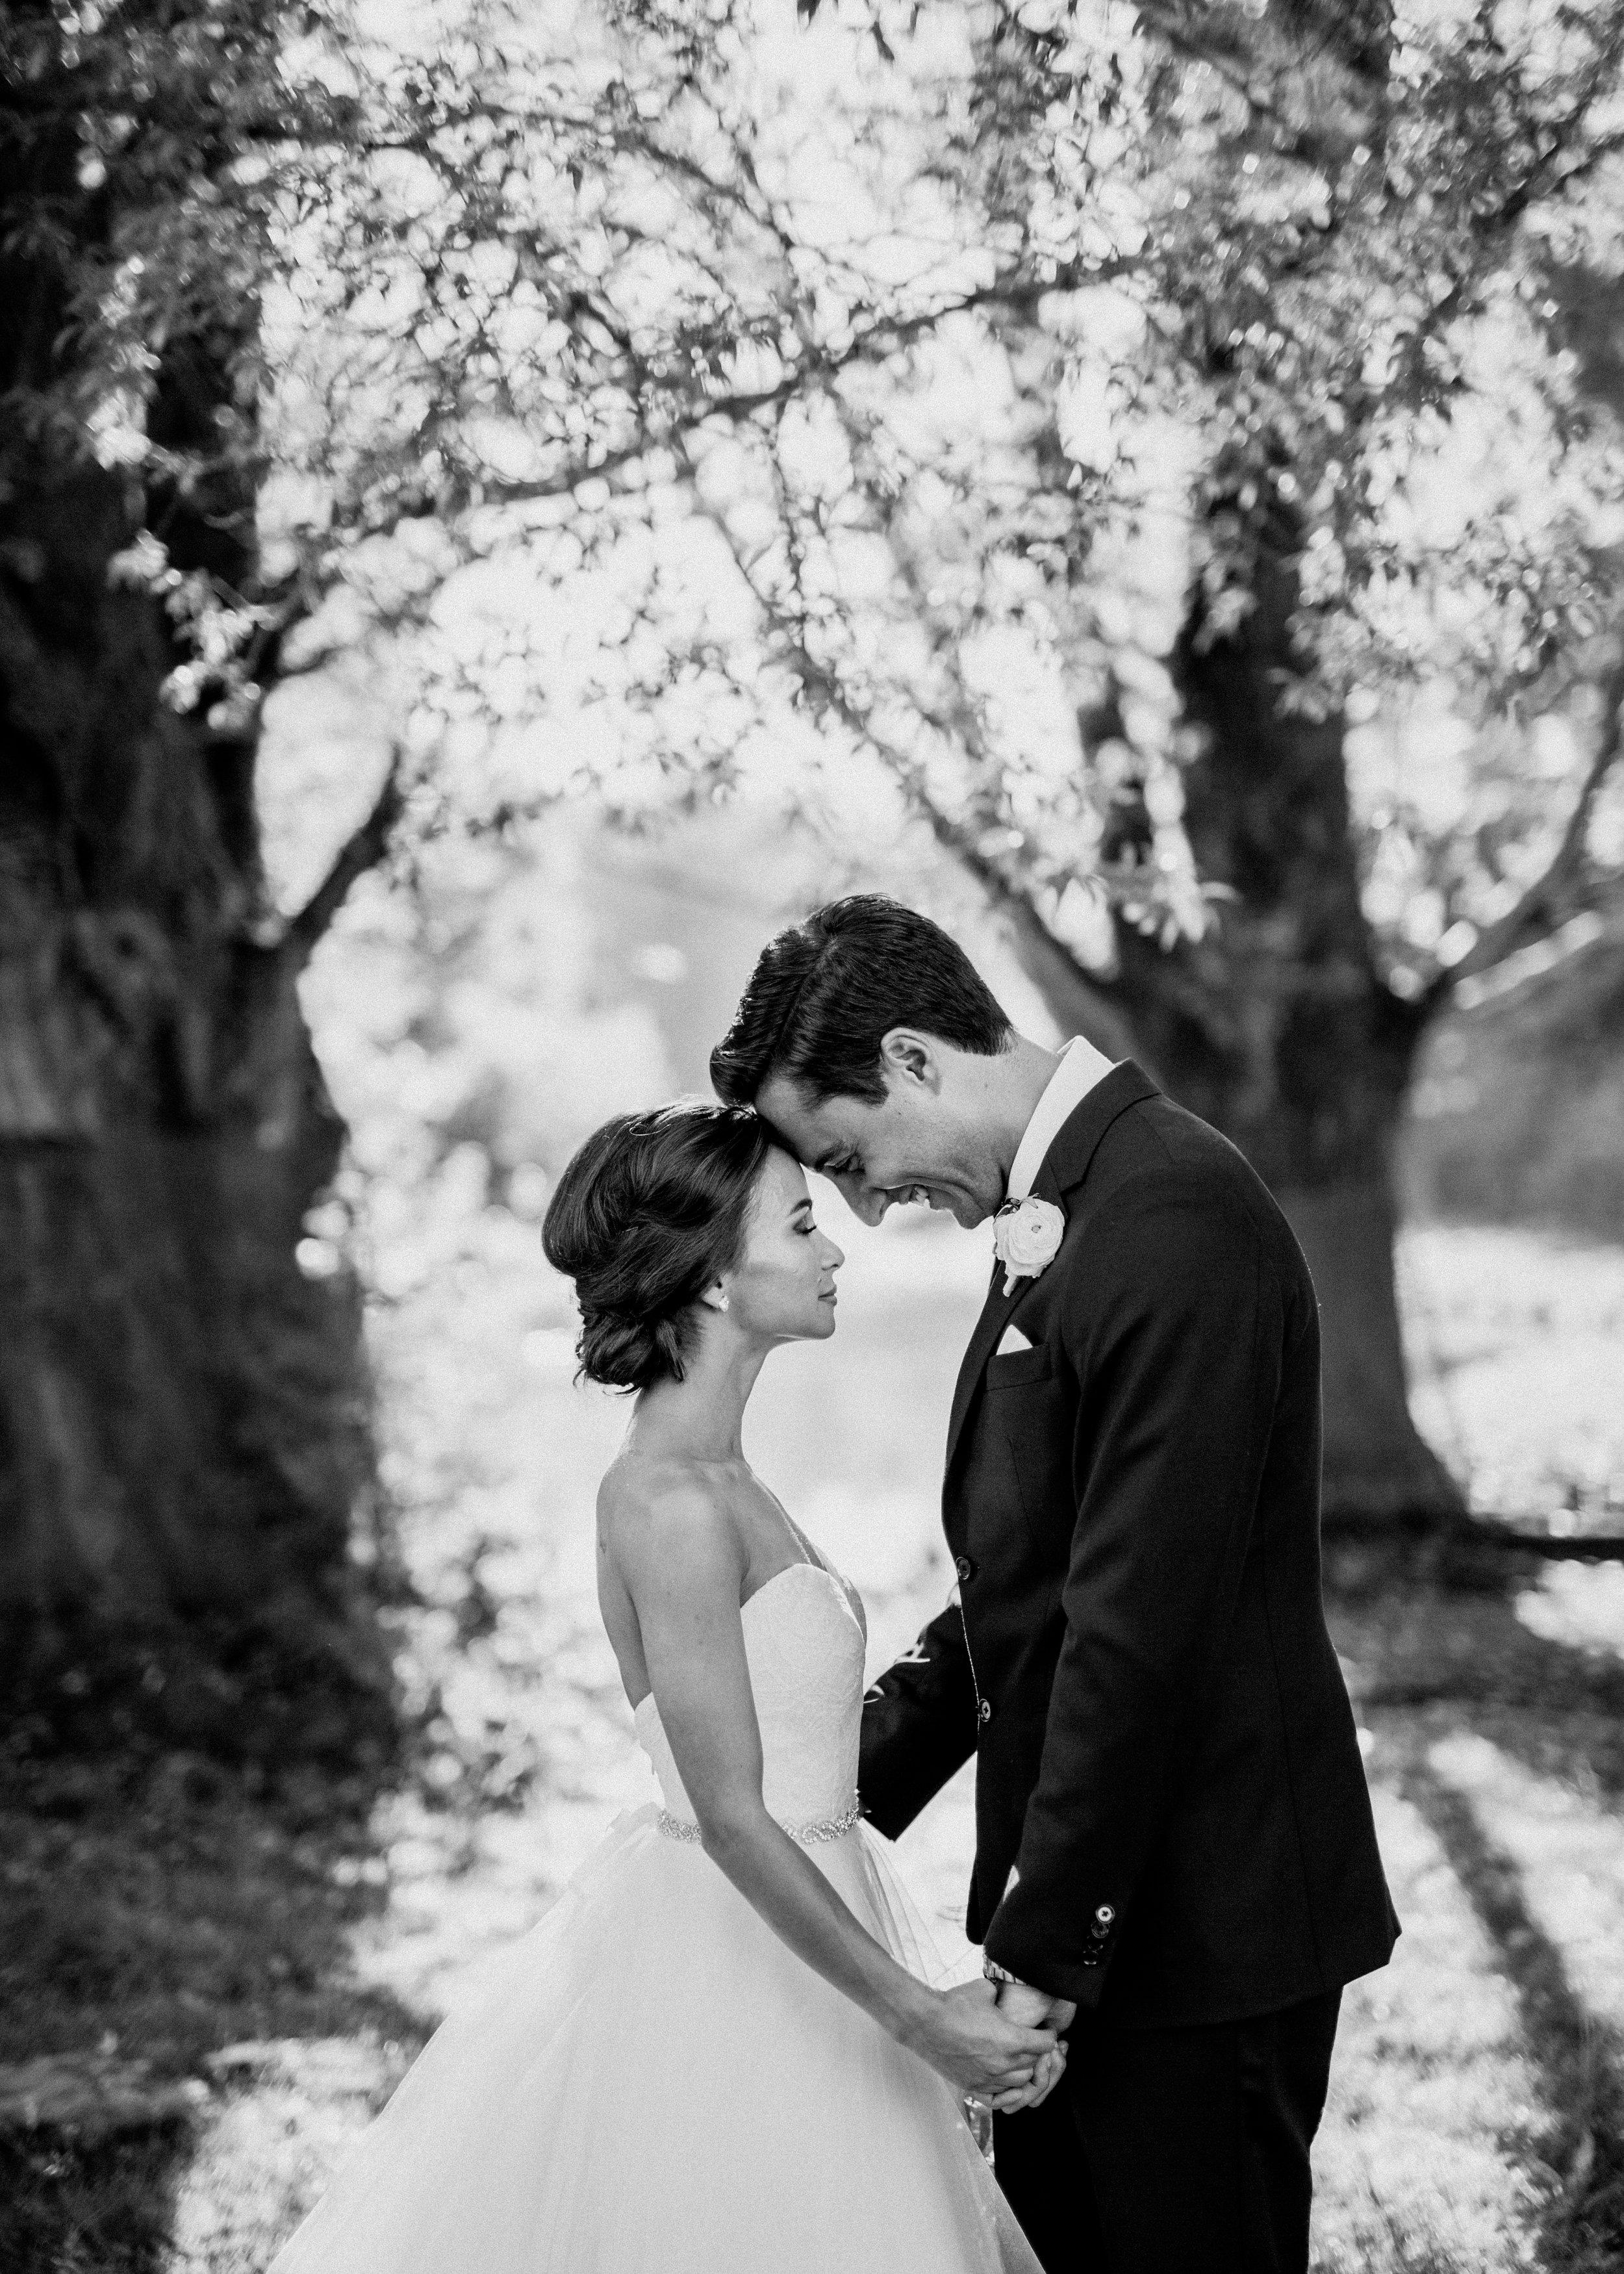 herafilms_carlotta_alex_wedding_hera_highres-39.jpg